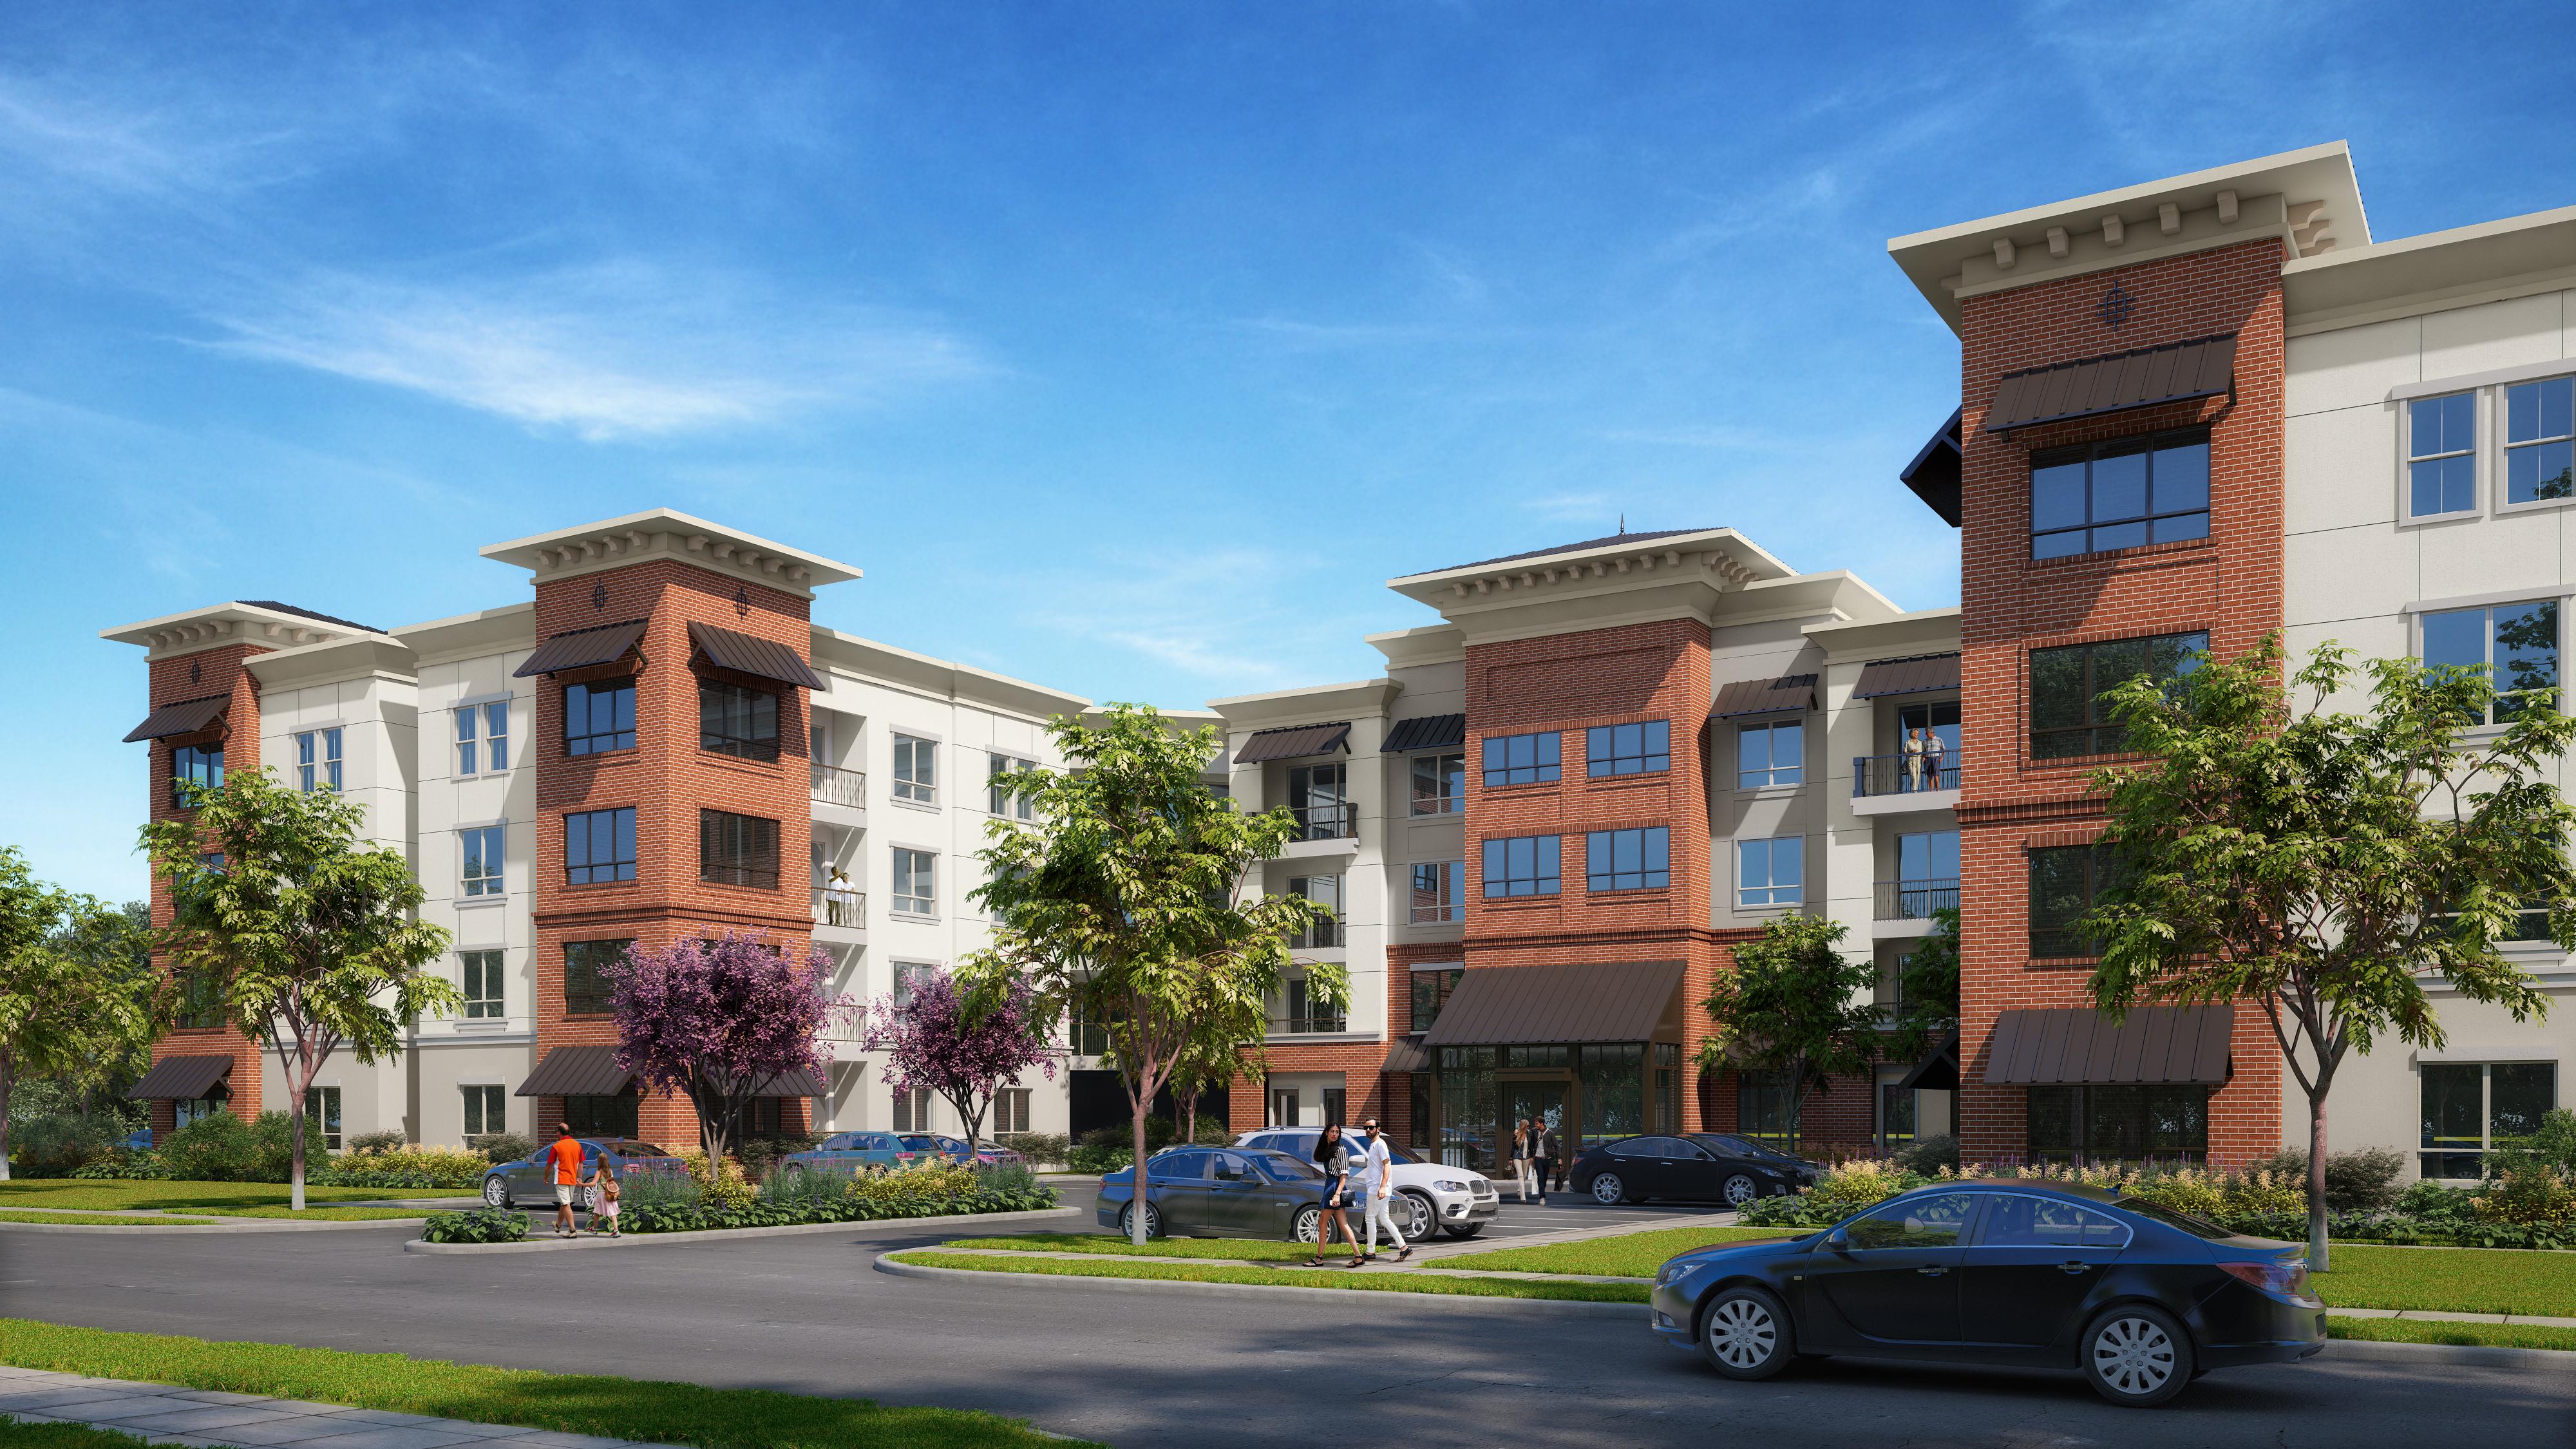 La Collina Apartment Building Set to Rise